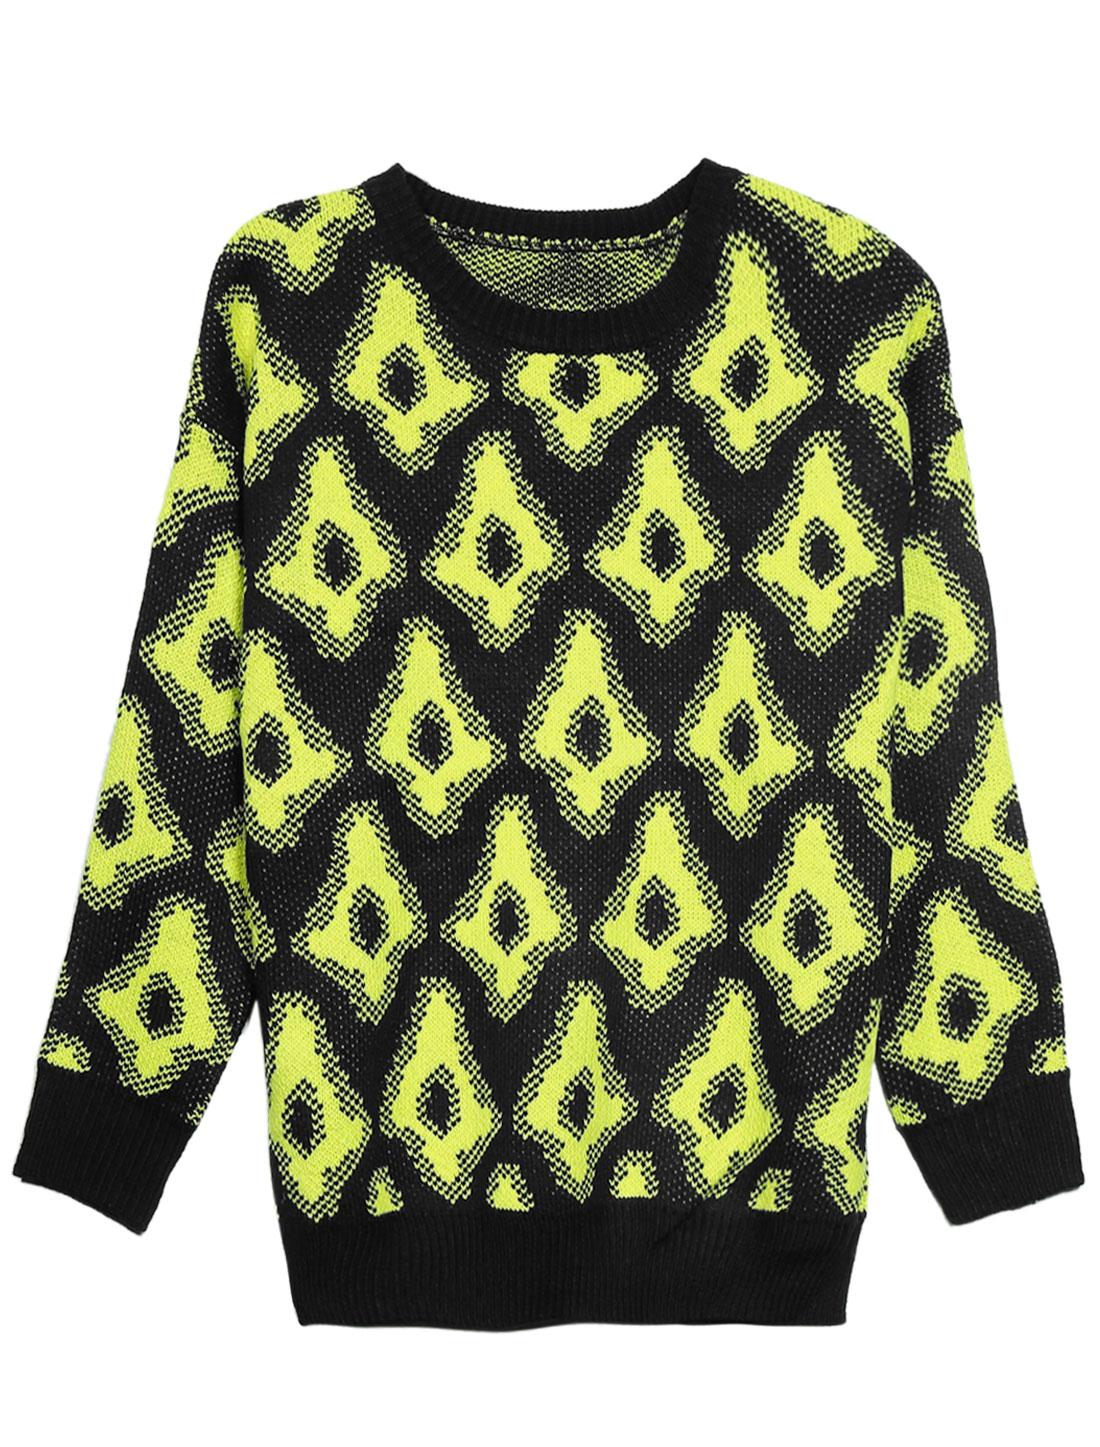 Women Argyle Pattern Slipover Long Sleeve Sweater Yellow Black M